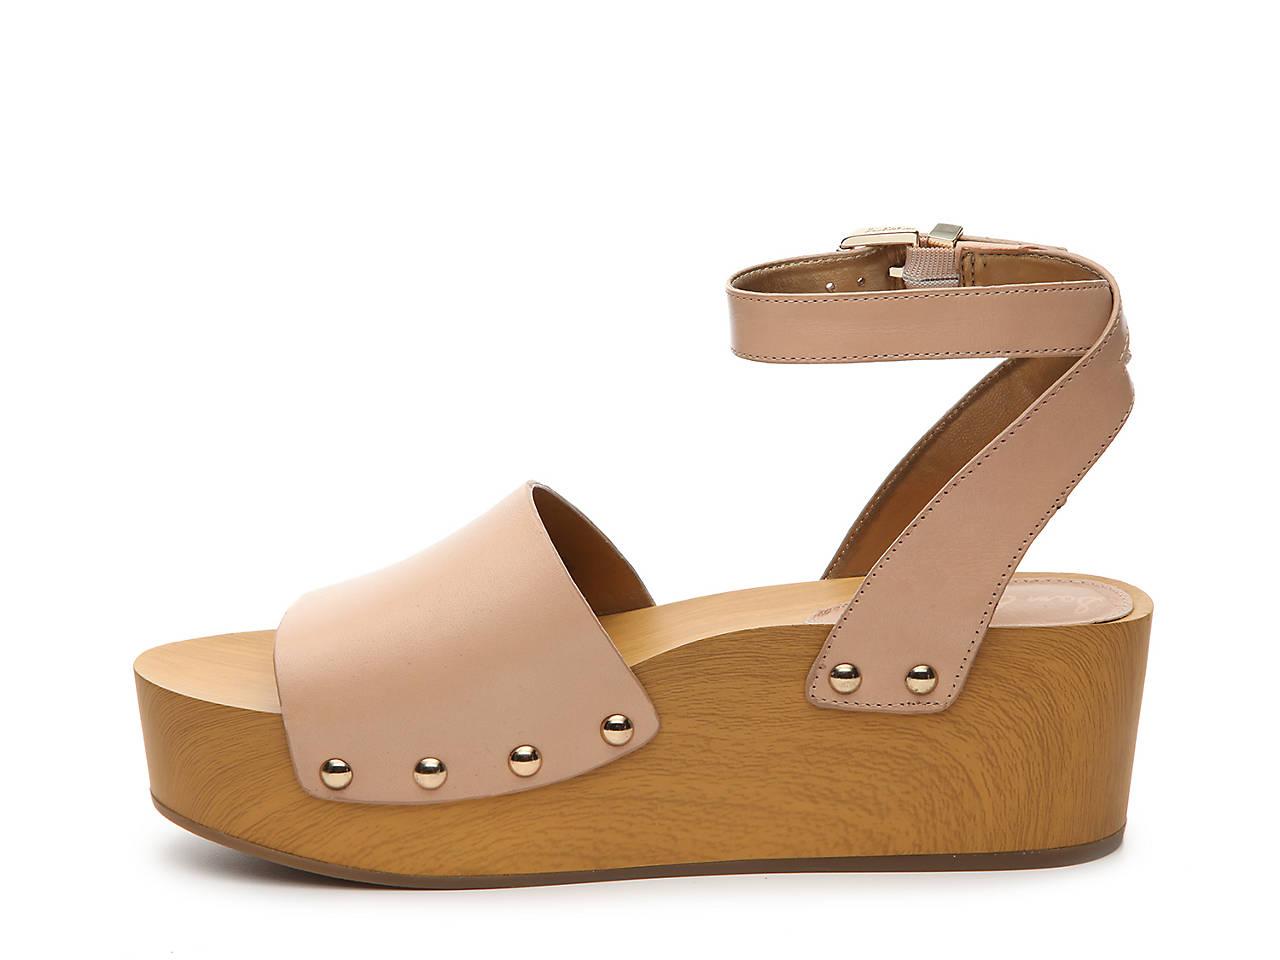 5c198b6ca Sam Edelman Brynn Wedge Sandal Women s Shoes